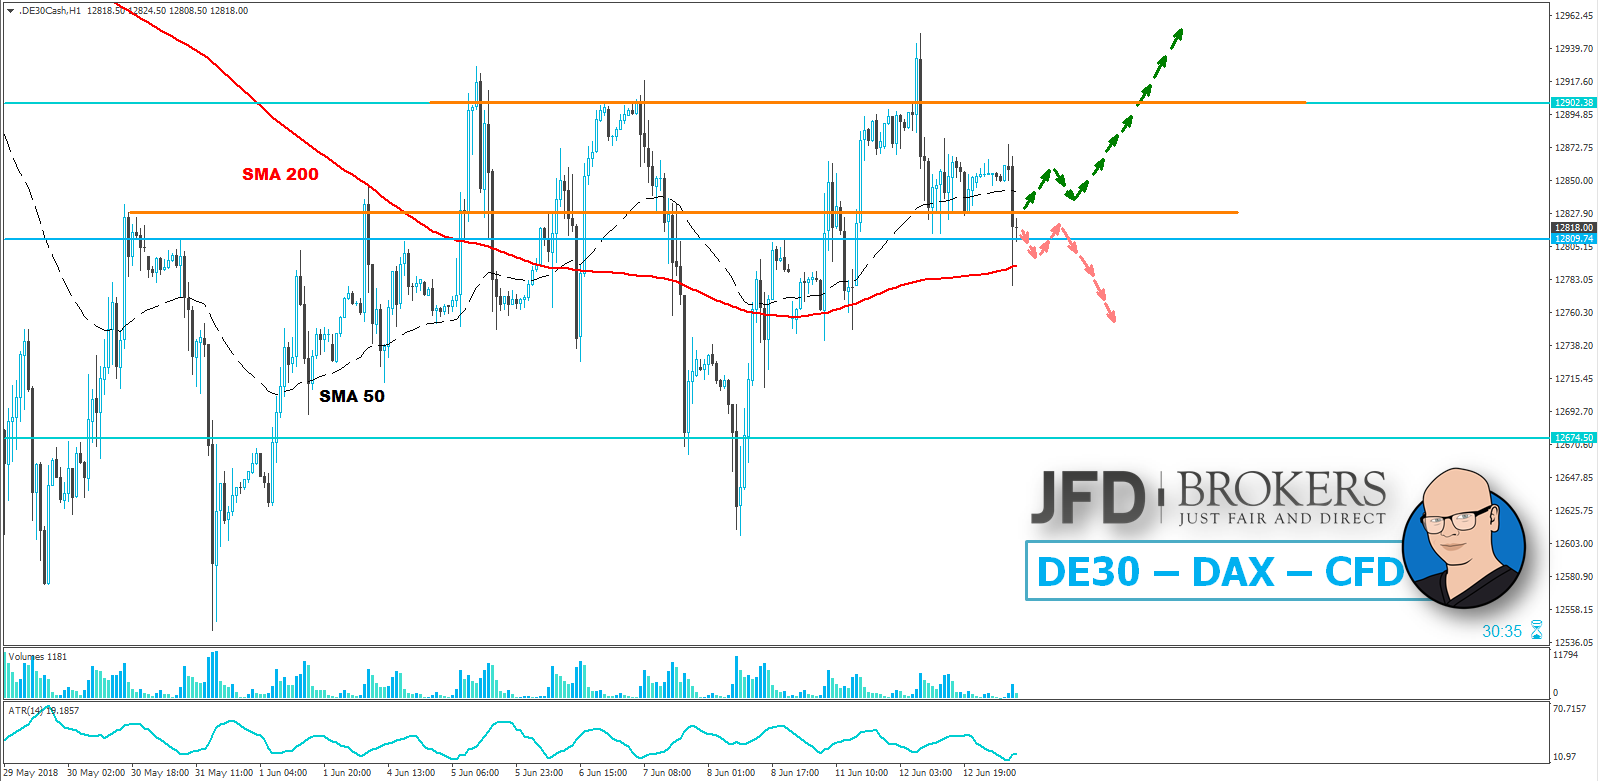 DAX-FED-Zinsentscheidung-könnte-neue-Bewegungsschübe-anstoßen-Kommentar-JFD-Brokers-GodmodeTrader.de-1